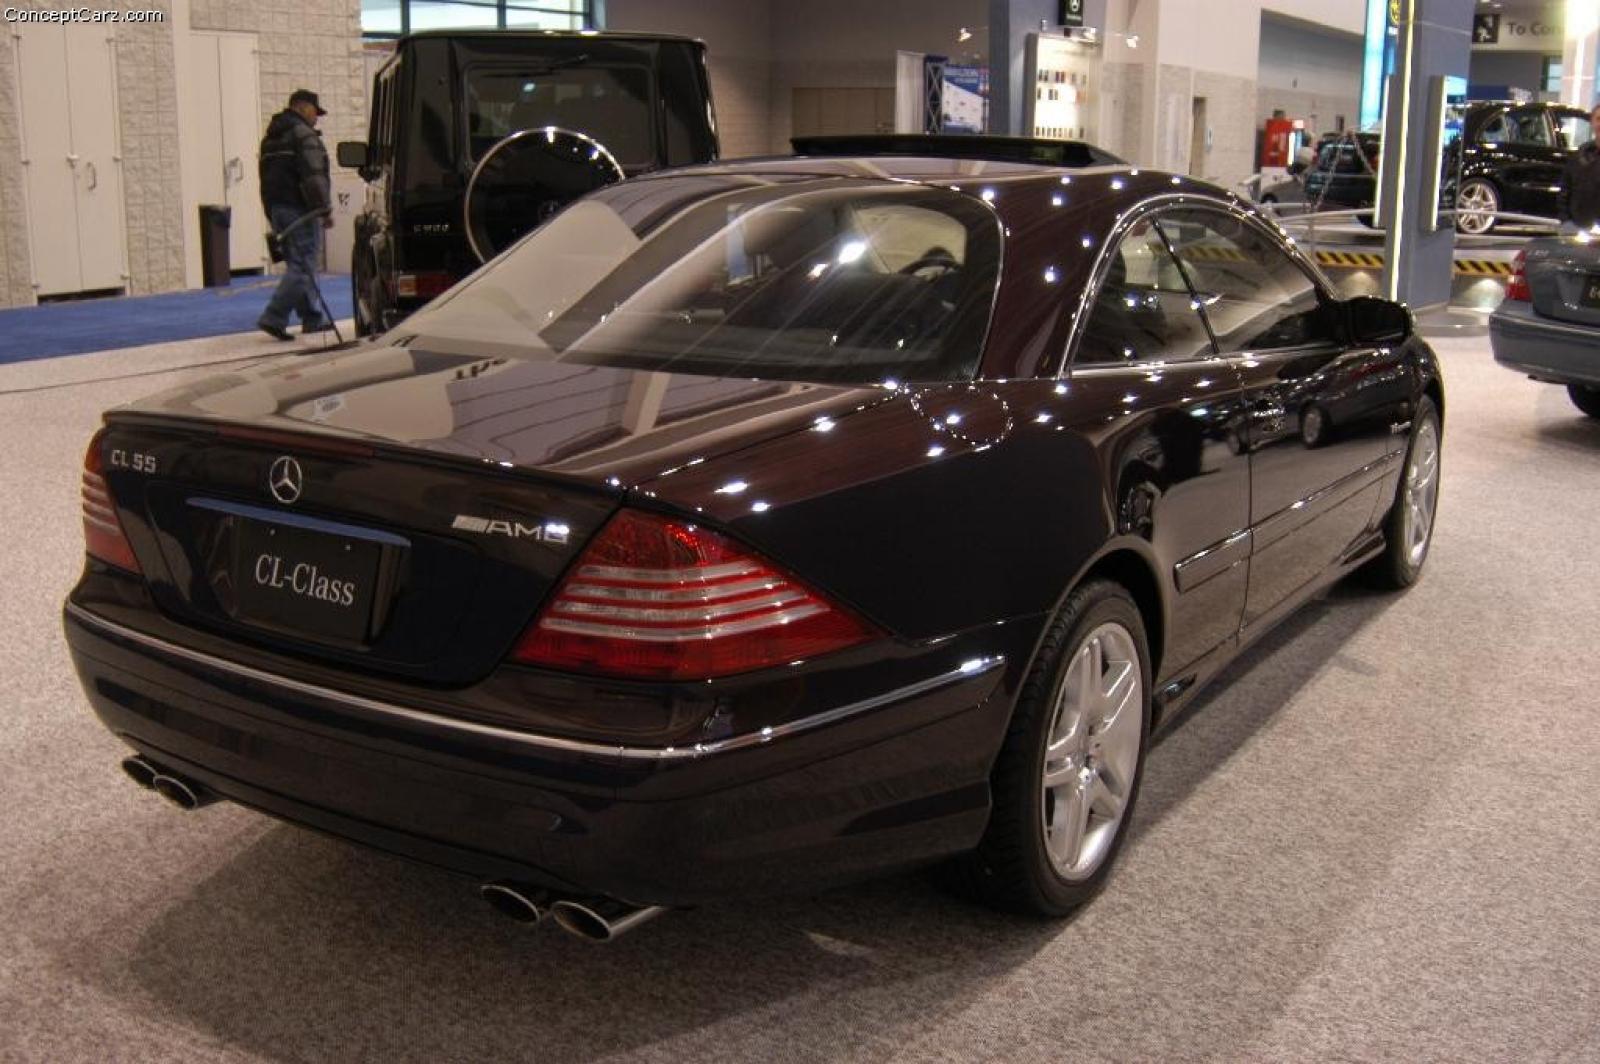 2004 mercedes benz cl class information and photos for Mercedes benz s class 2004